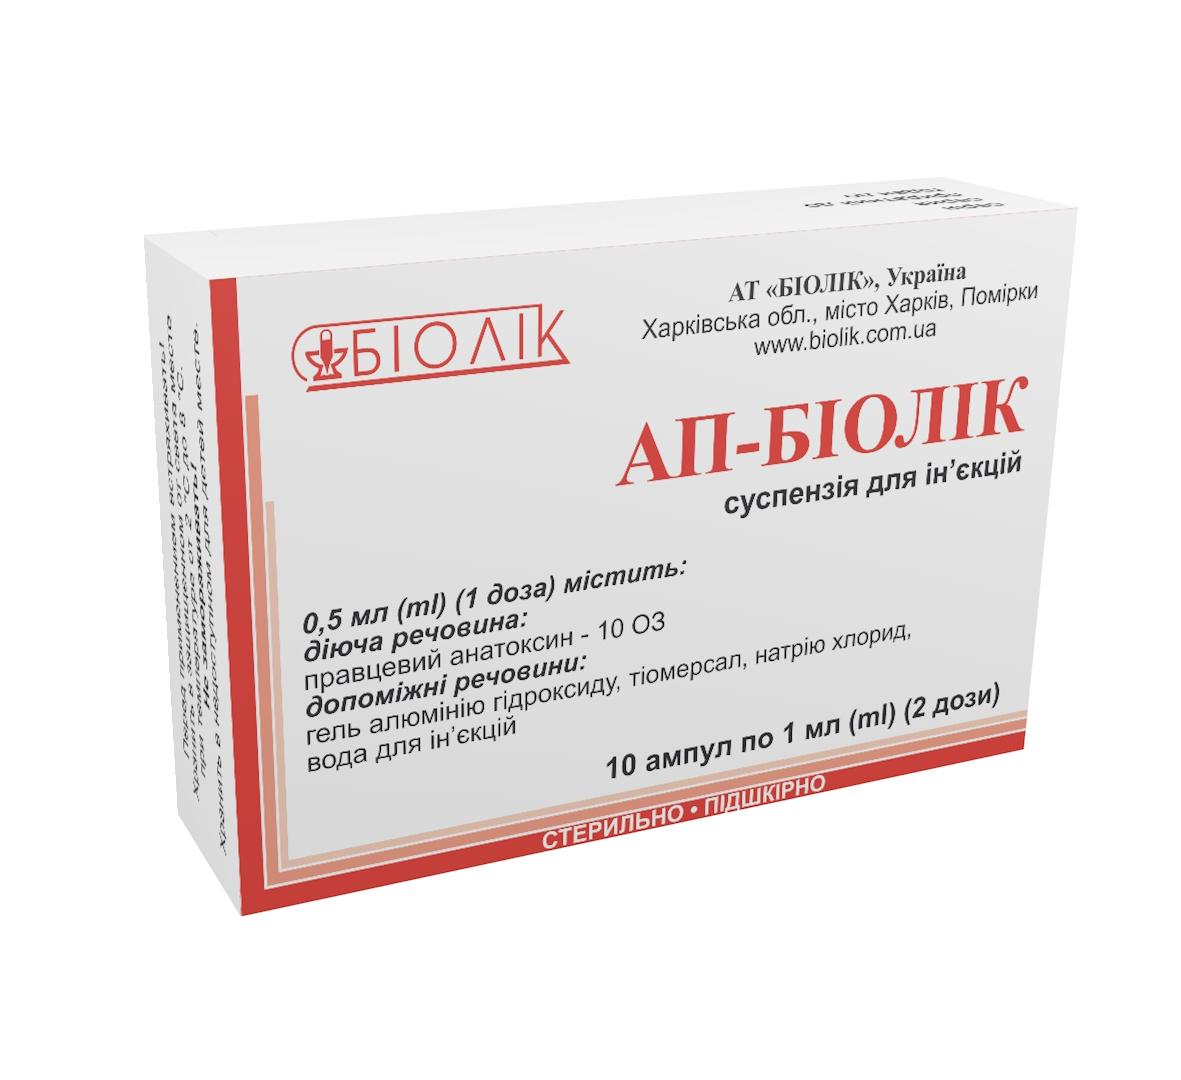 АС-Биолек